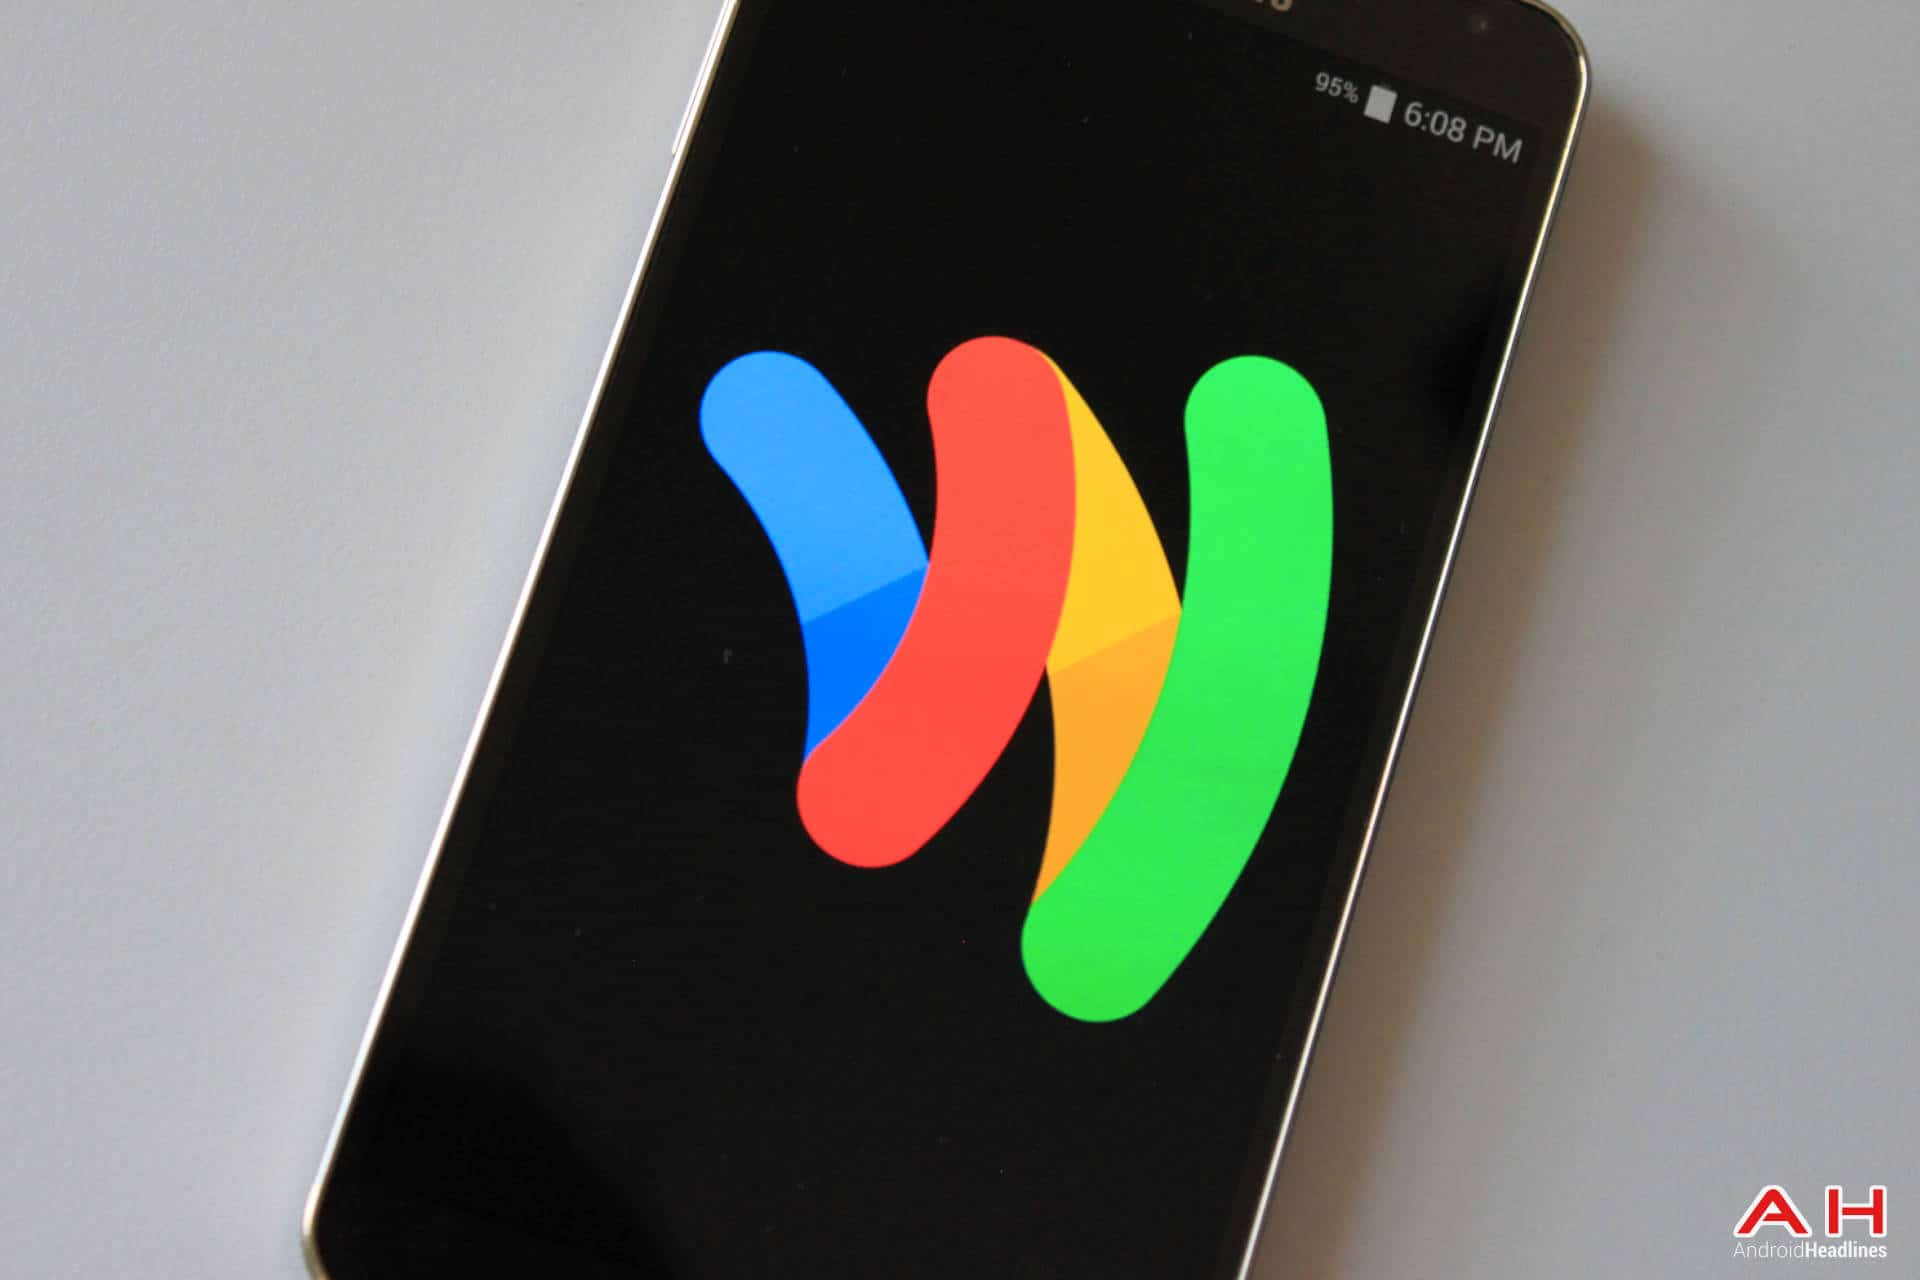 AH Google Wallet Mobile Payments 1.1